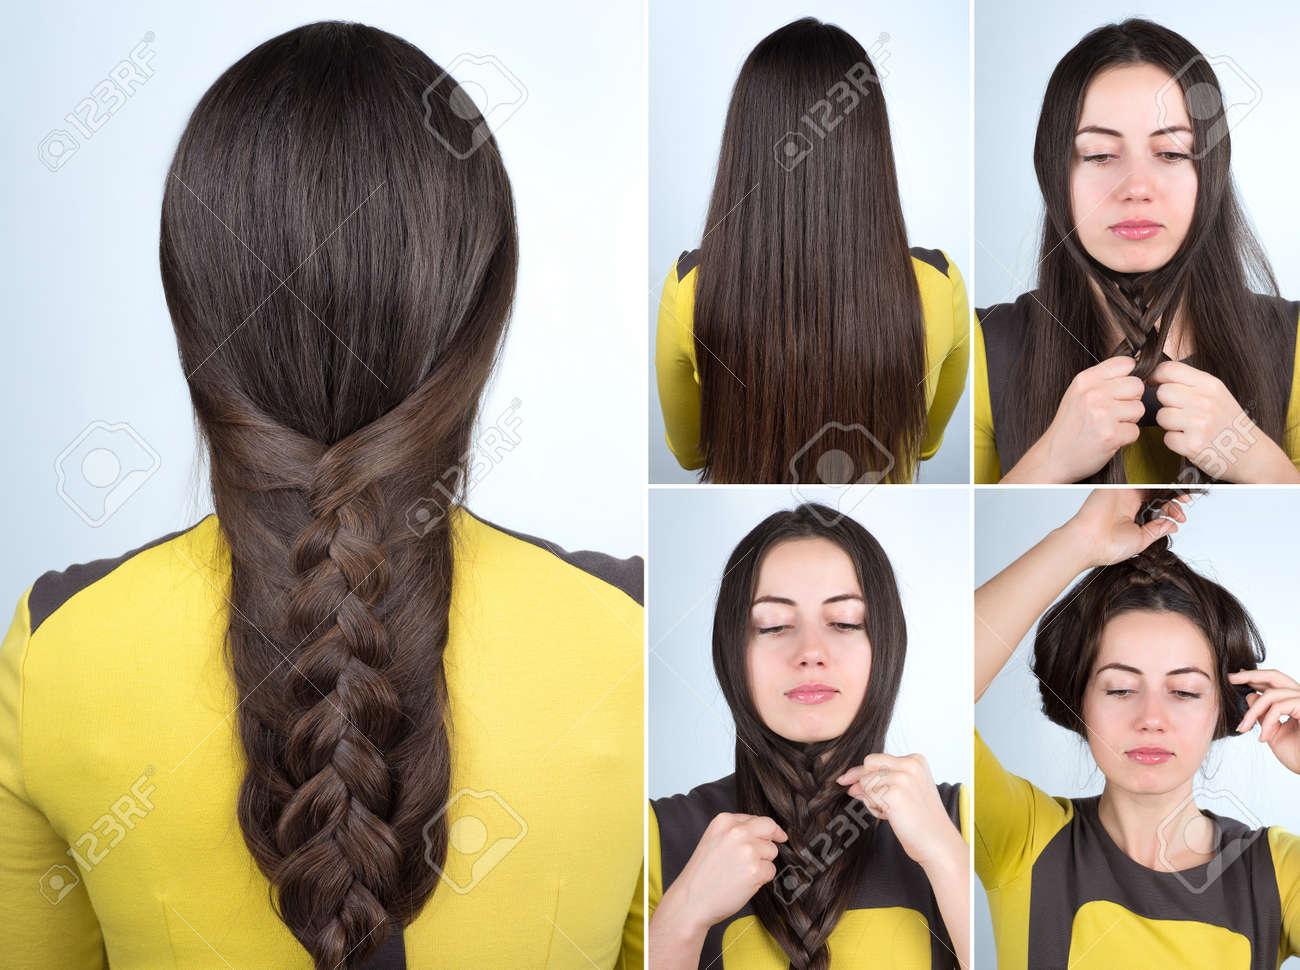 Einfache Zopf Frisur Tutorial Plait Frisur Fur Lange Haare